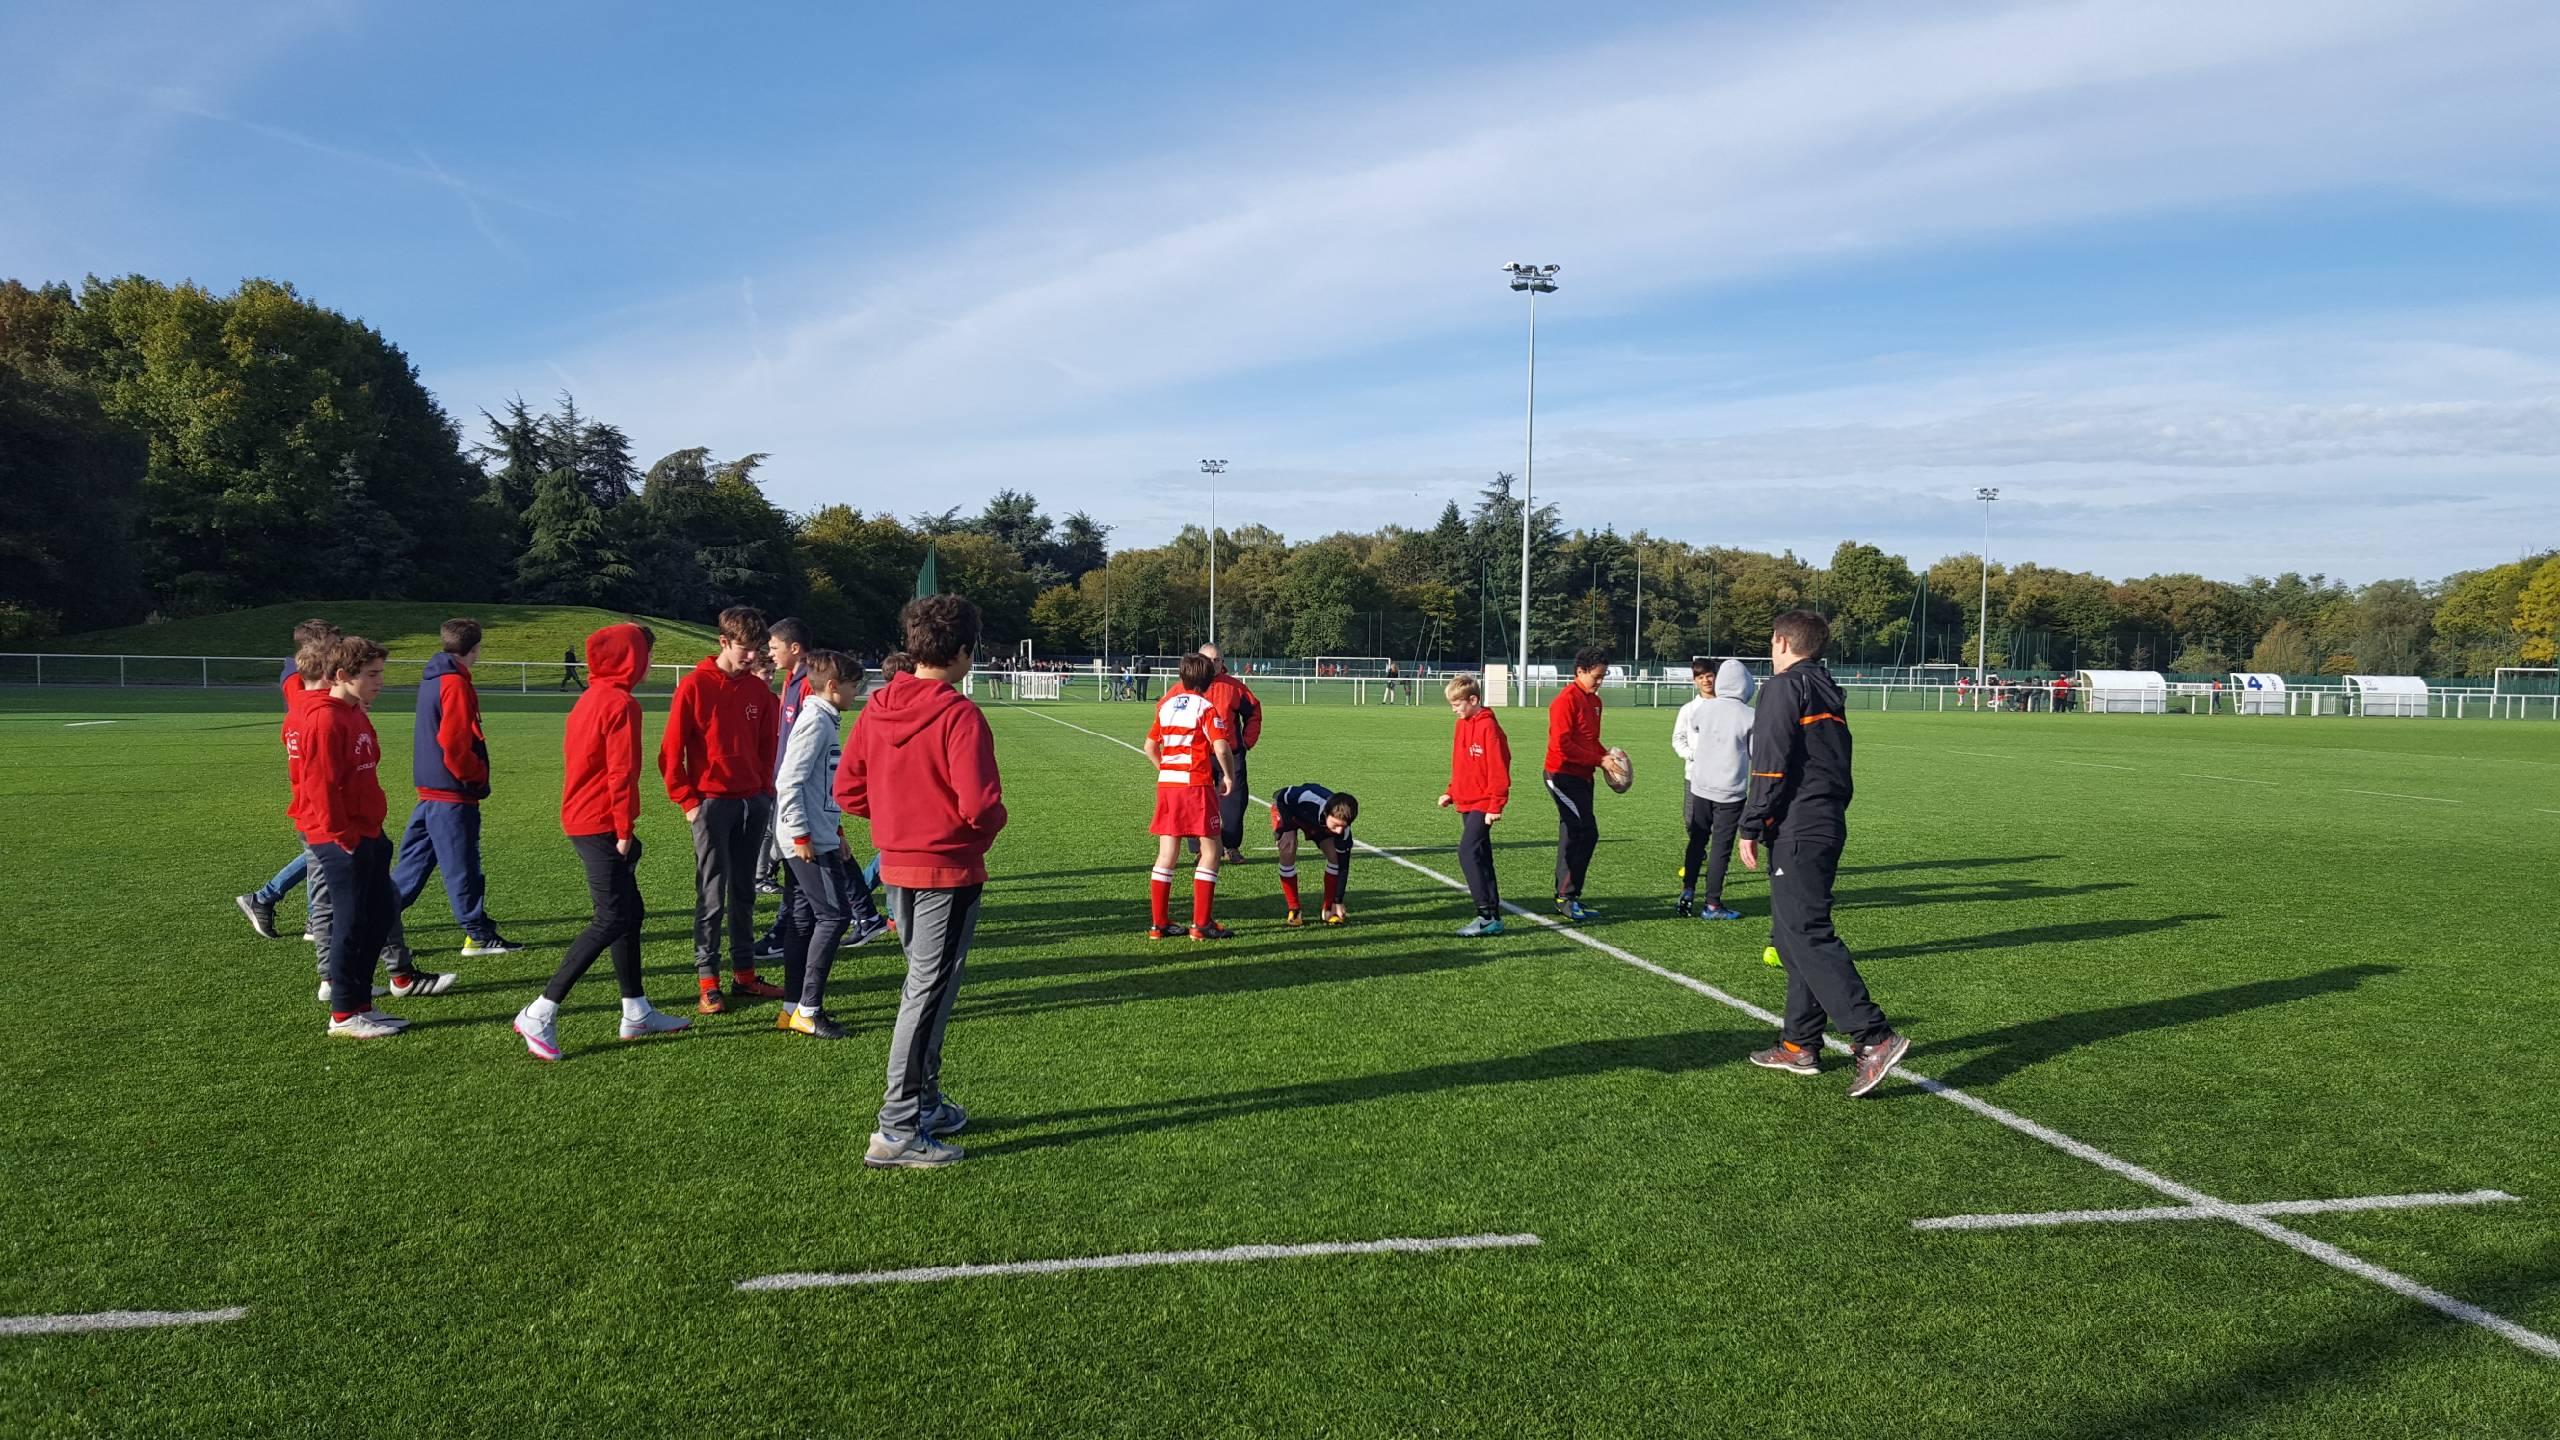 Clamart rugby 92 CPS Arbitrage des U14 7 octobre 2017